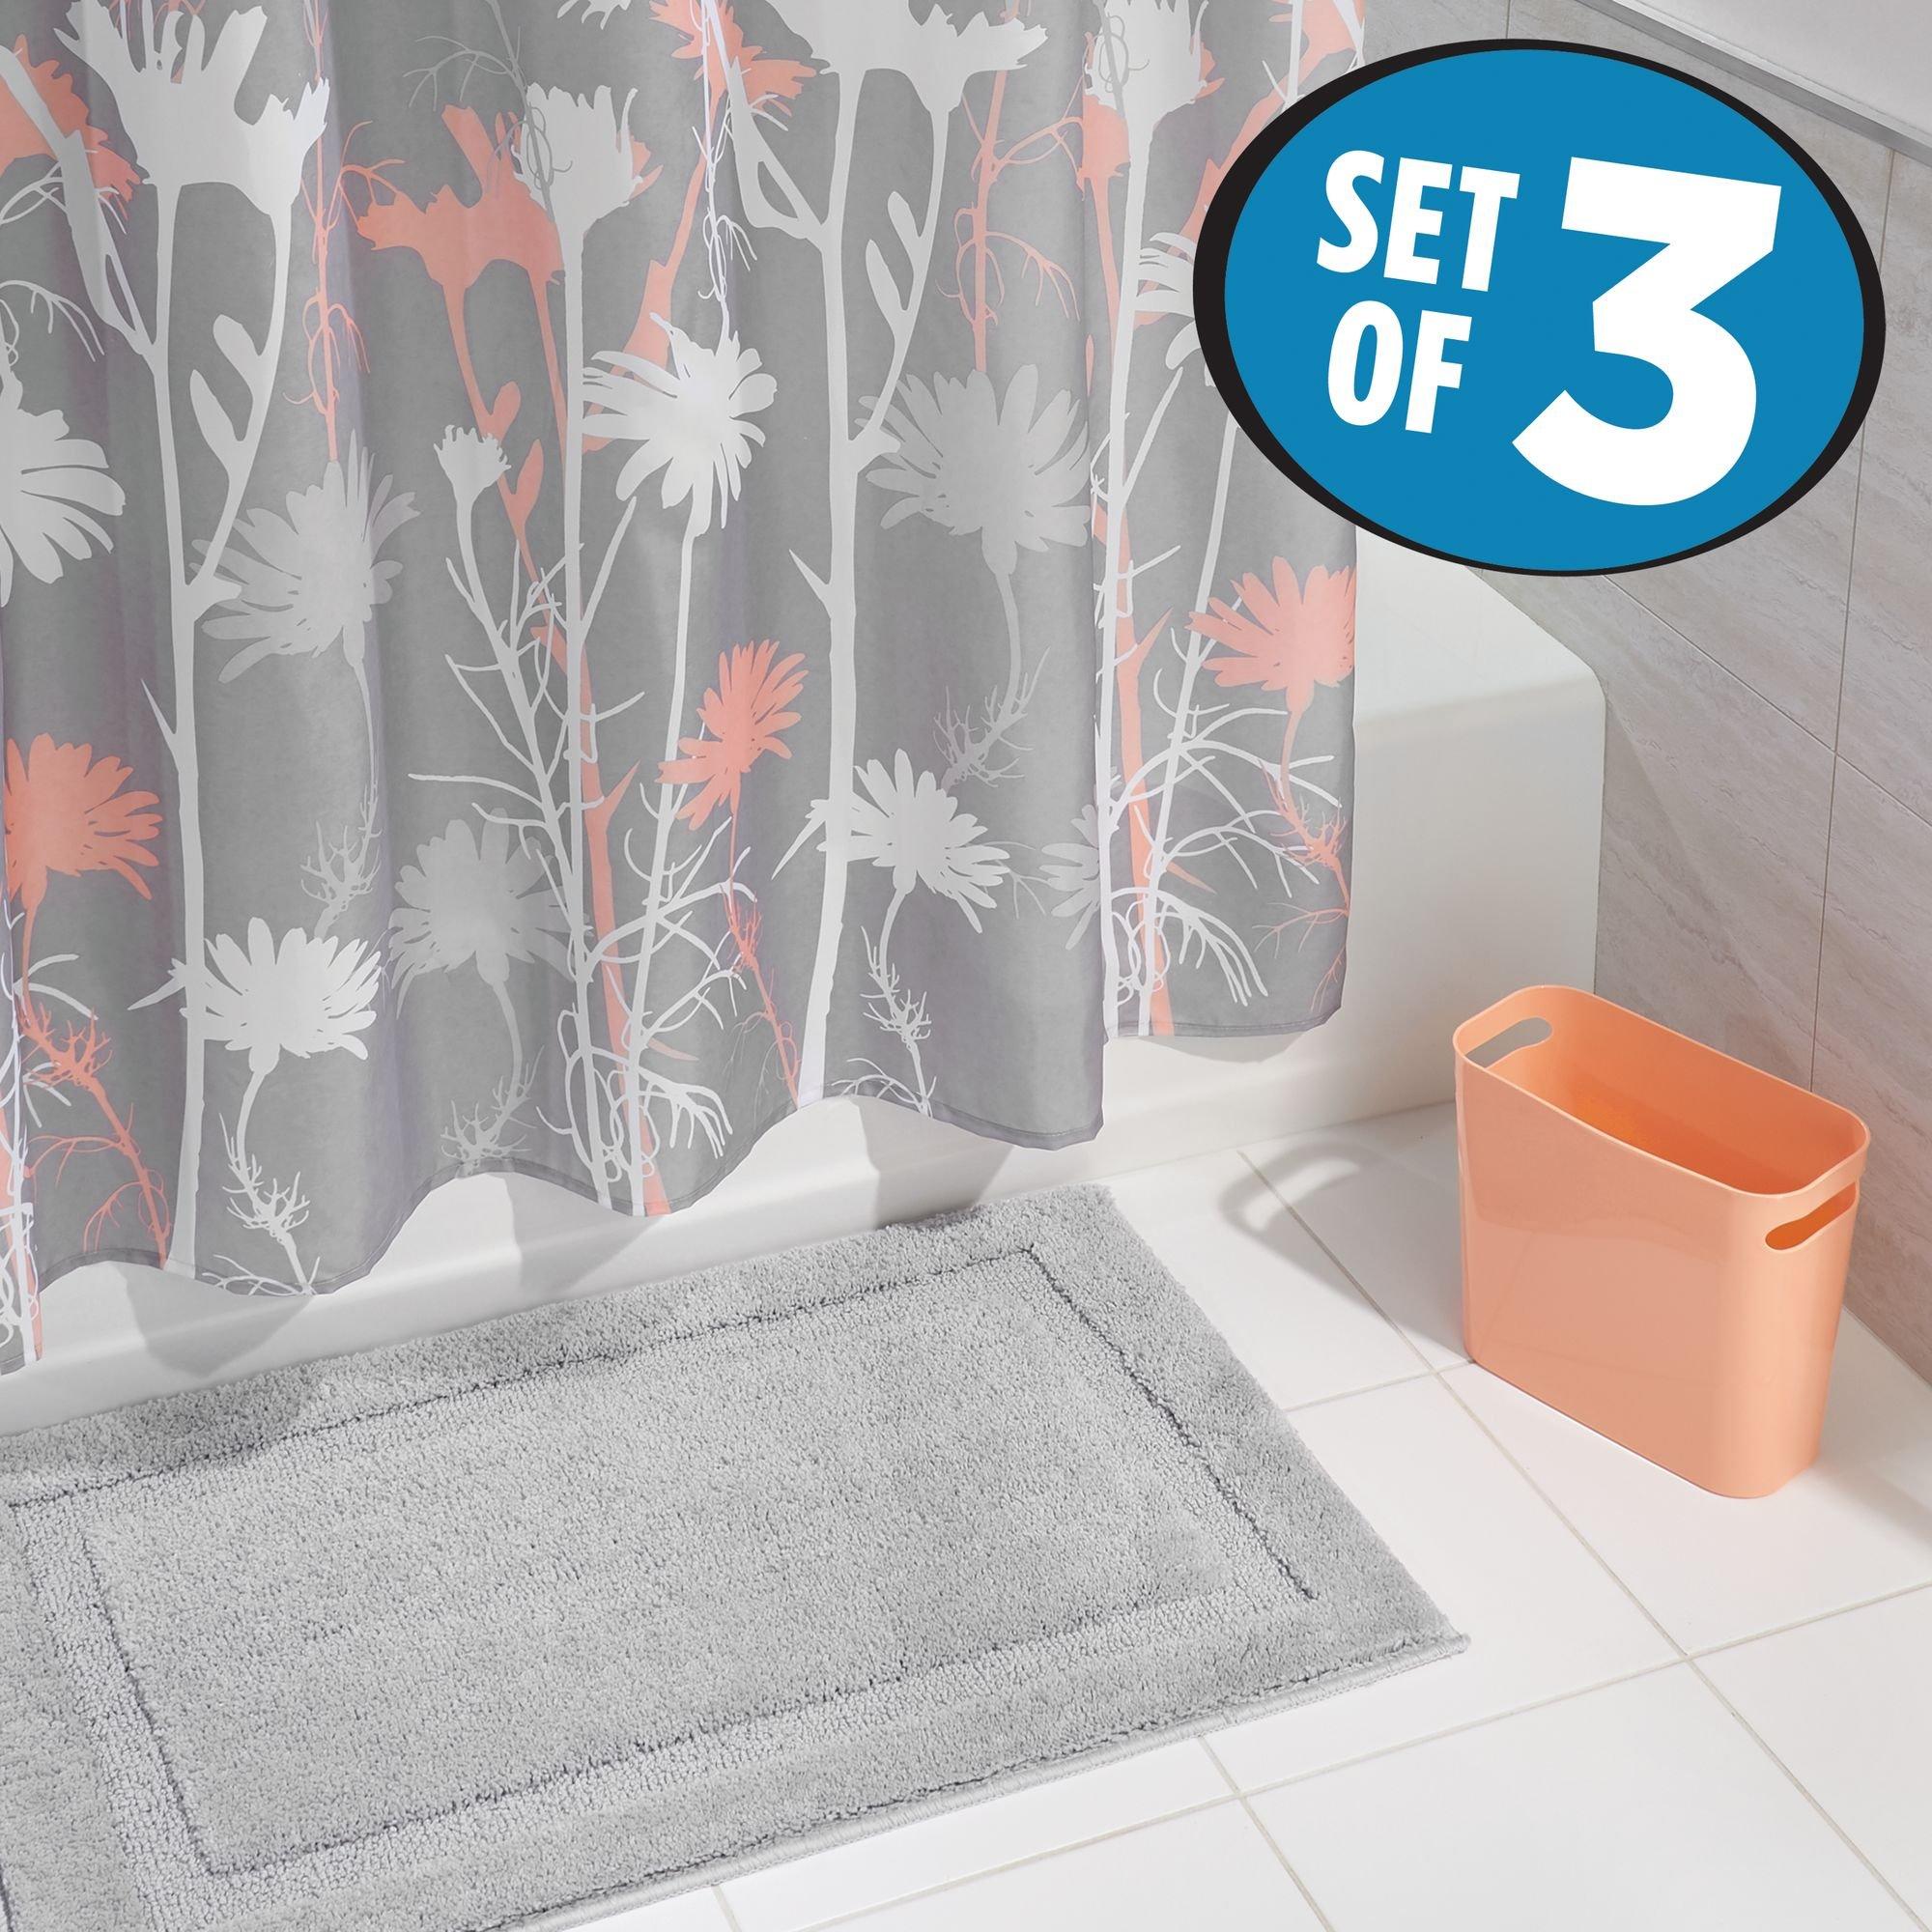 mDesign Bathroom Accessory Set, Flower Power Shower Curtain, Spa Bath Mat/Rug, Wastebasket Trash Can - Set of 3, Gray/Coral